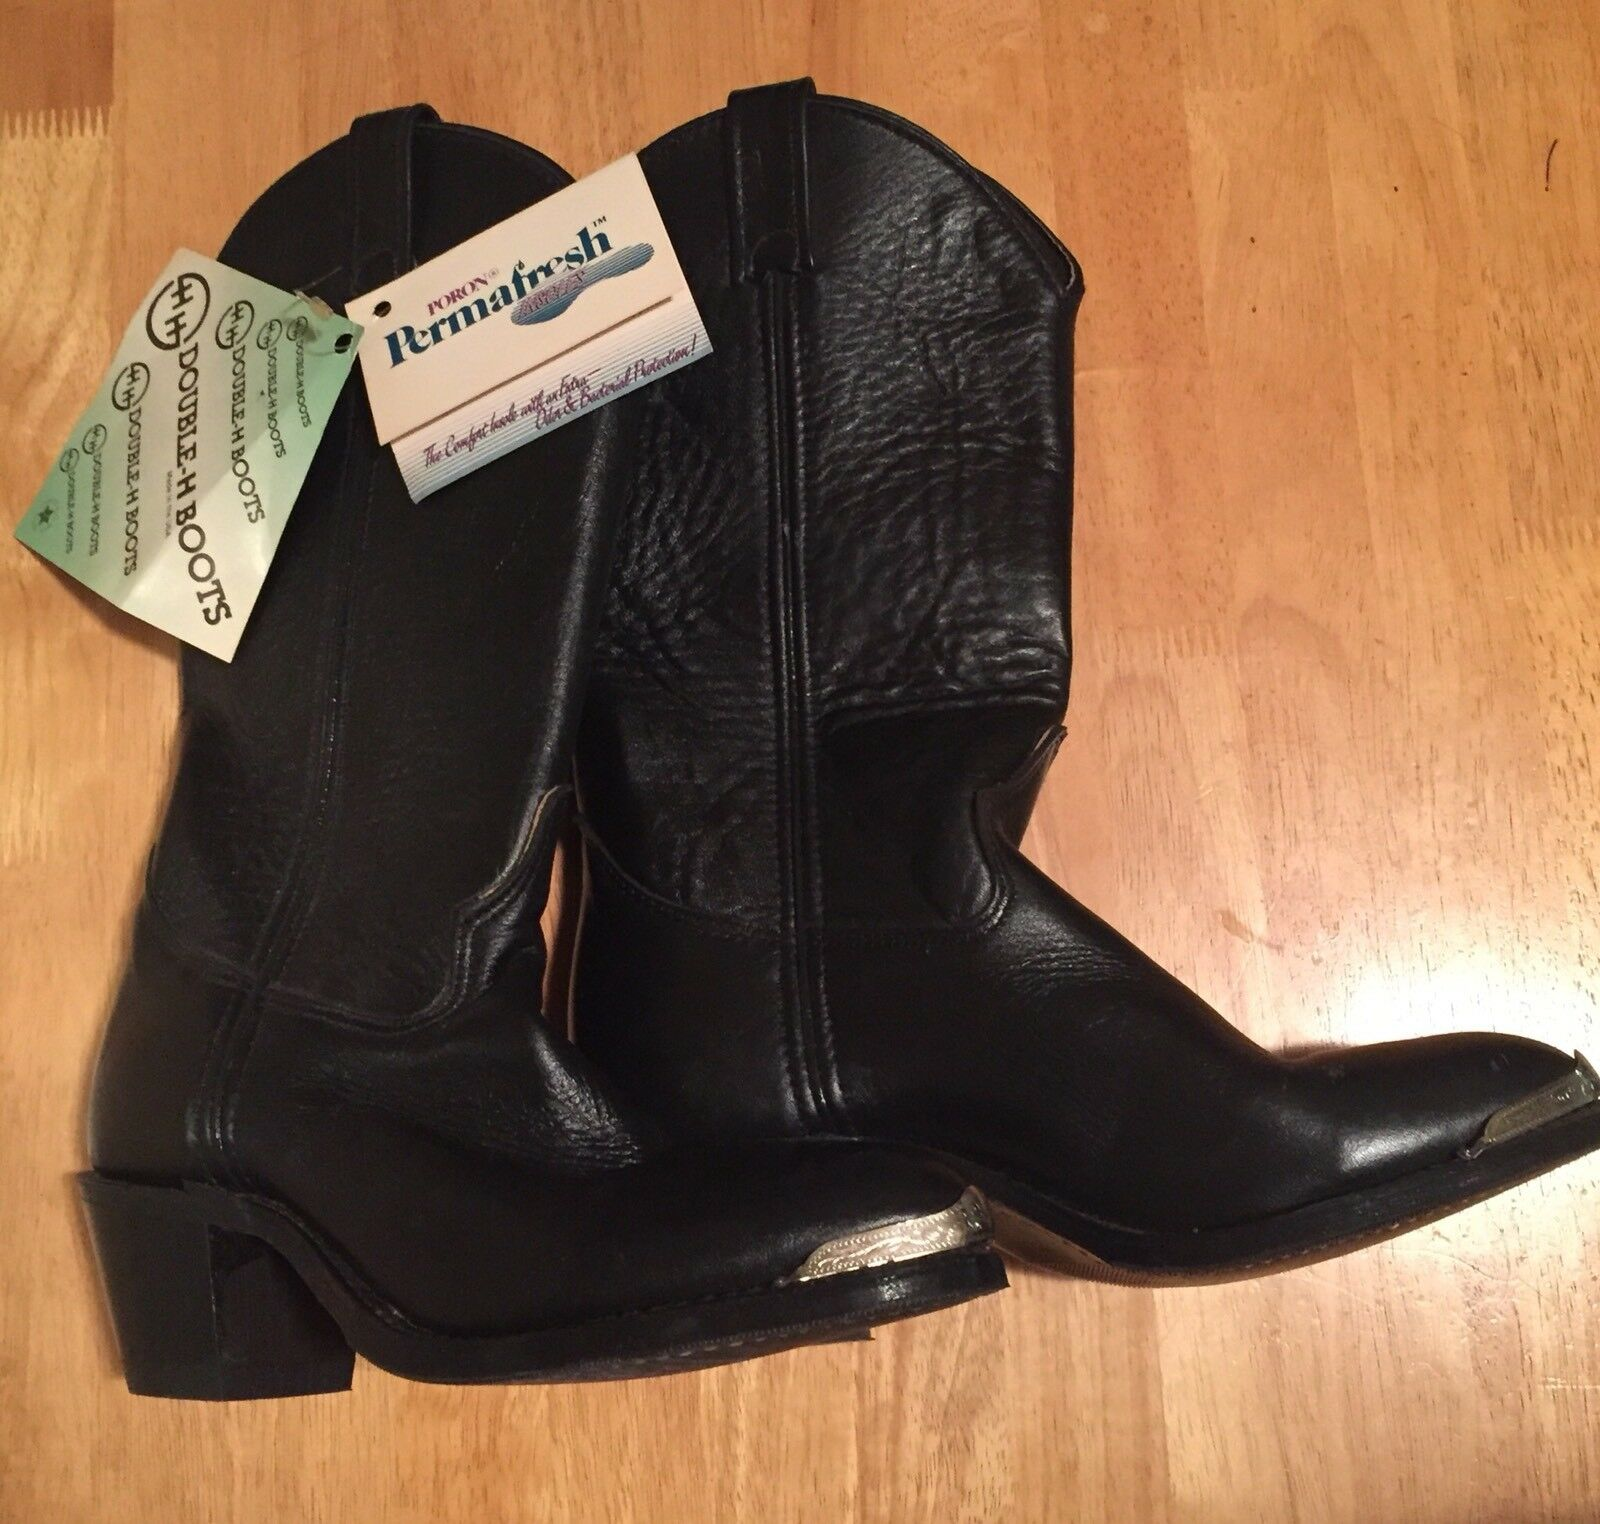 Double H boots Western Cowboy Ranch Wear Women's size 7M Black -NWT